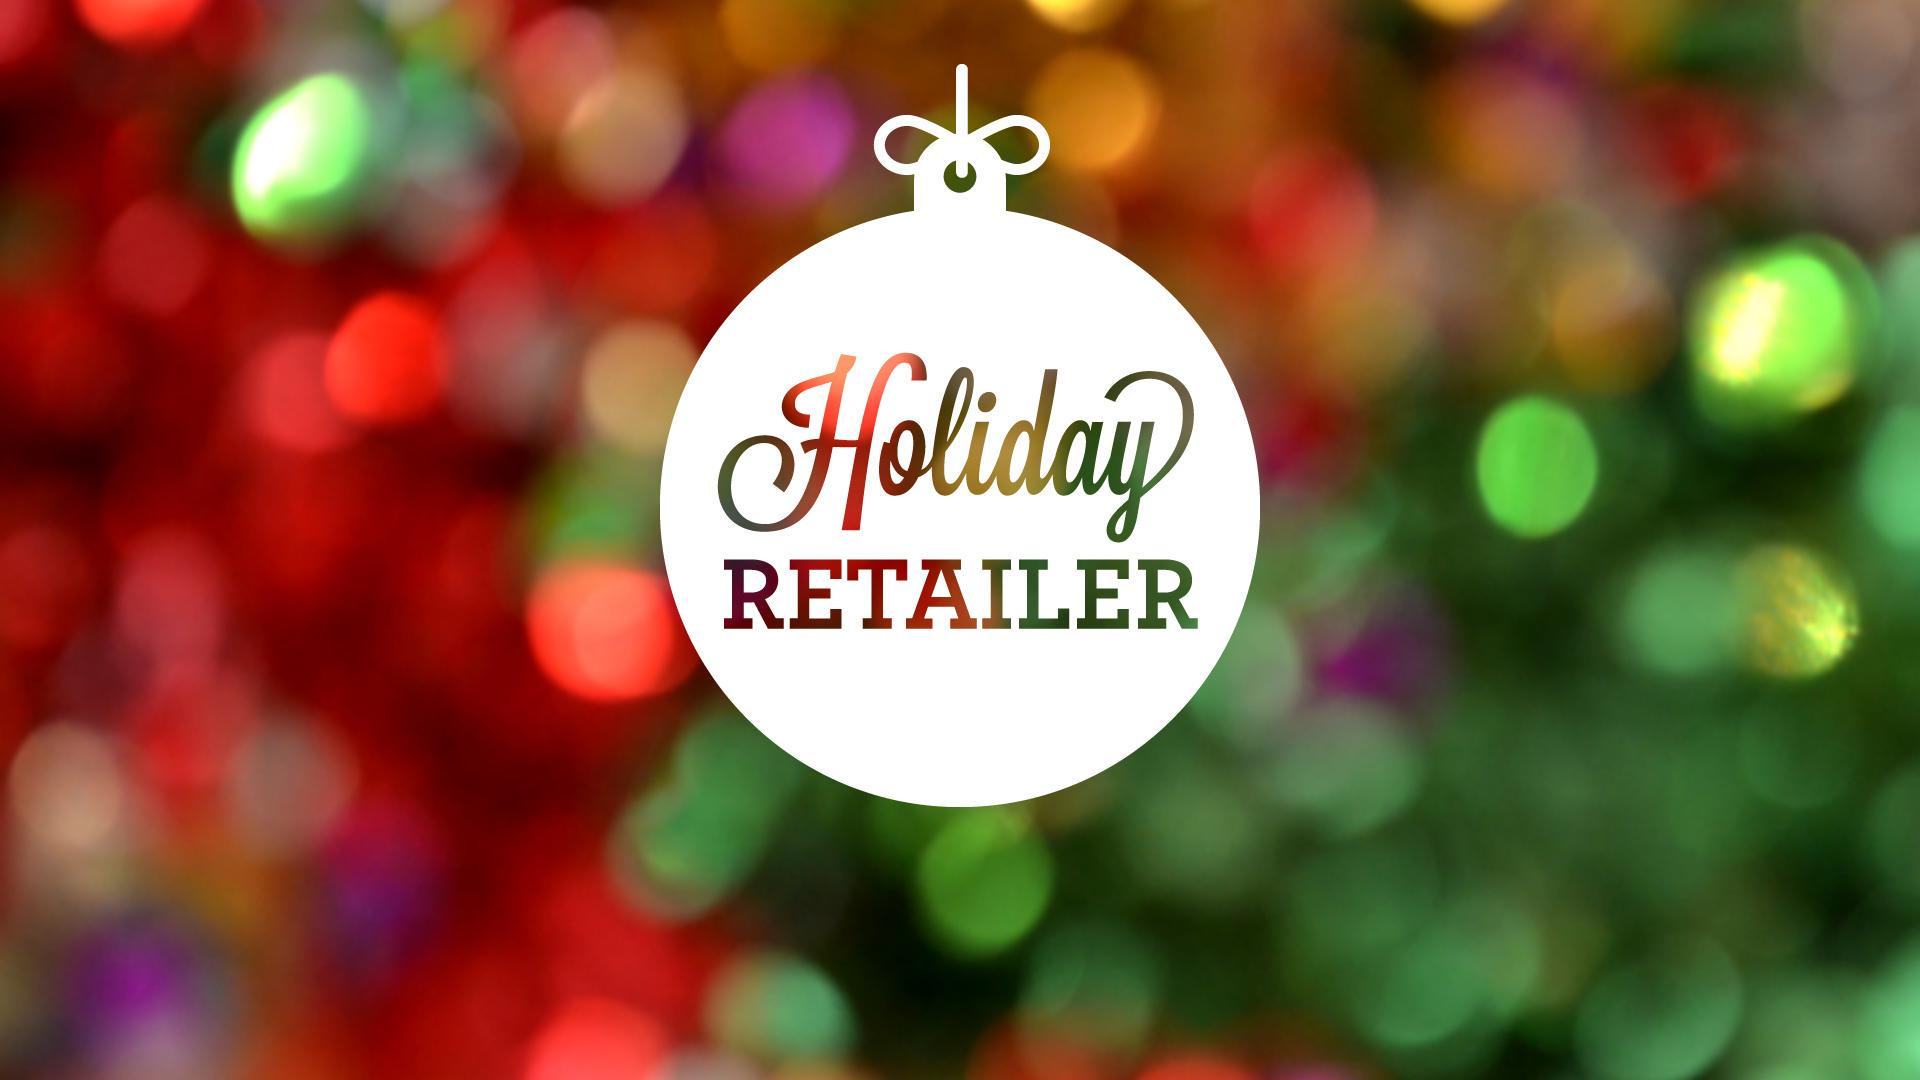 holiday-retailer2016a-ss-1920